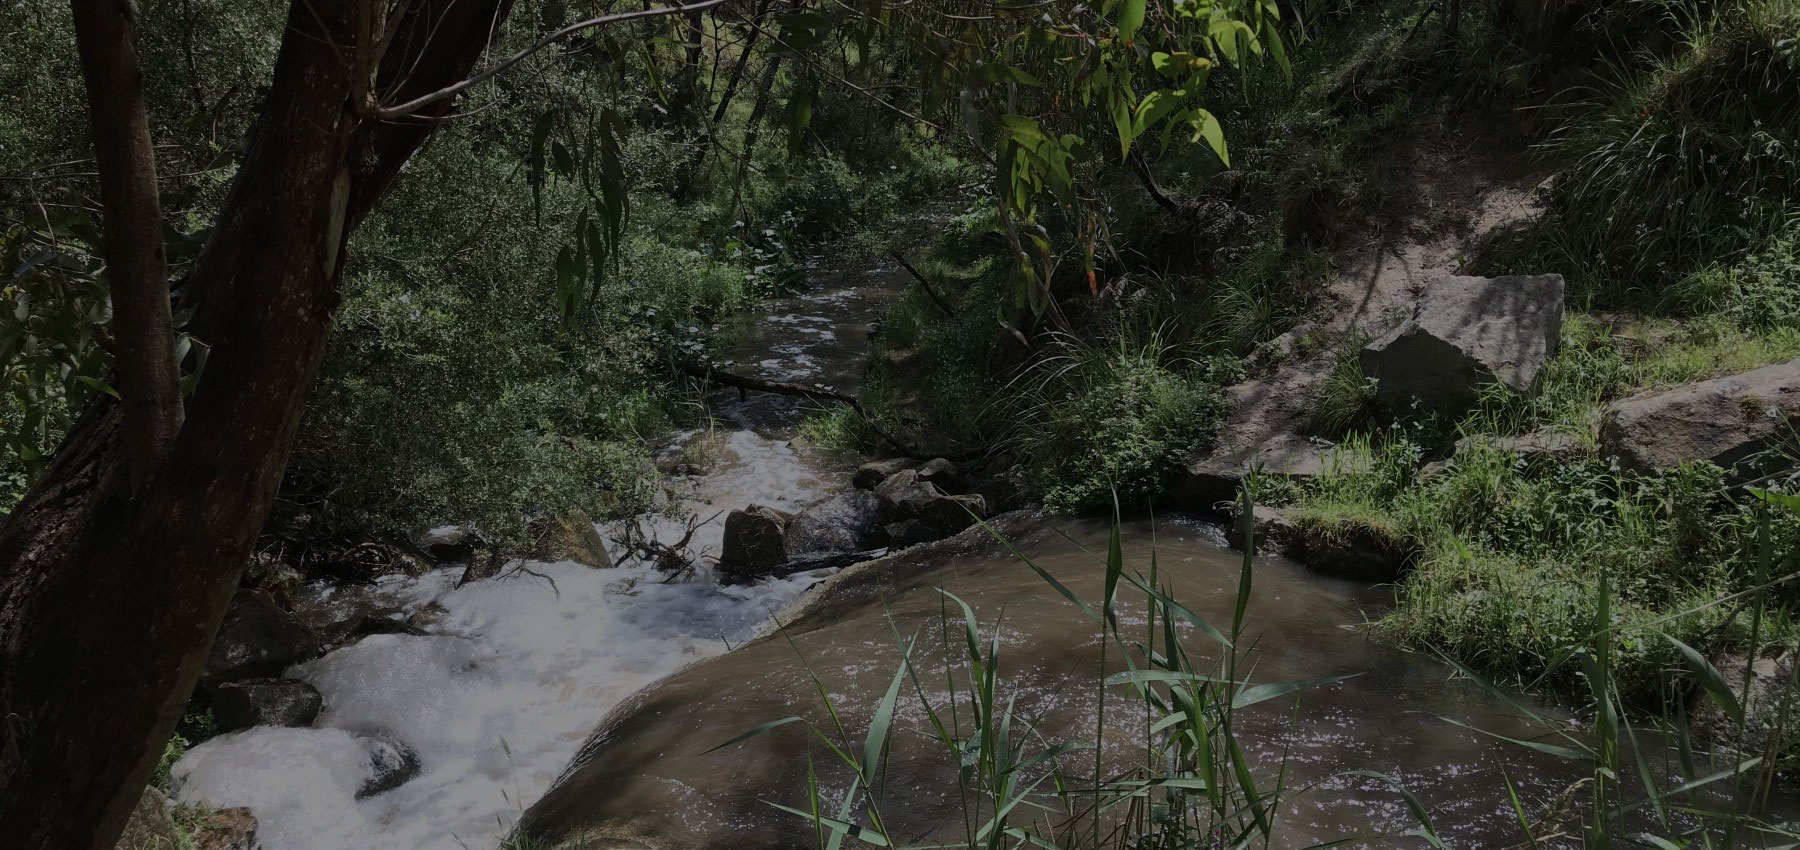 Sweetwater Creek Frankston Bushwalk | Mornington Peninsula Bushwalks